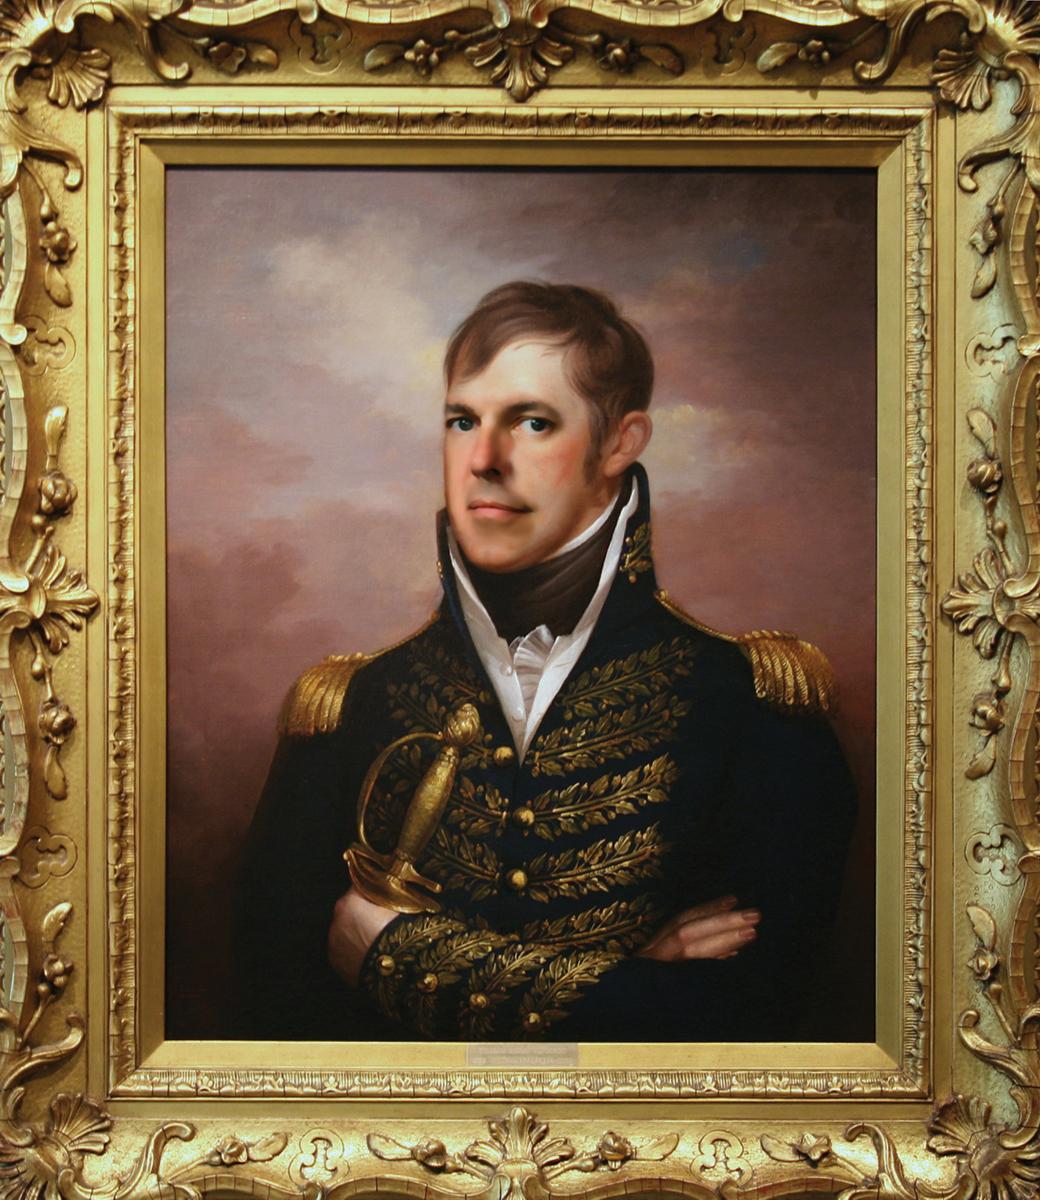 Sean: President William Henry Harrison